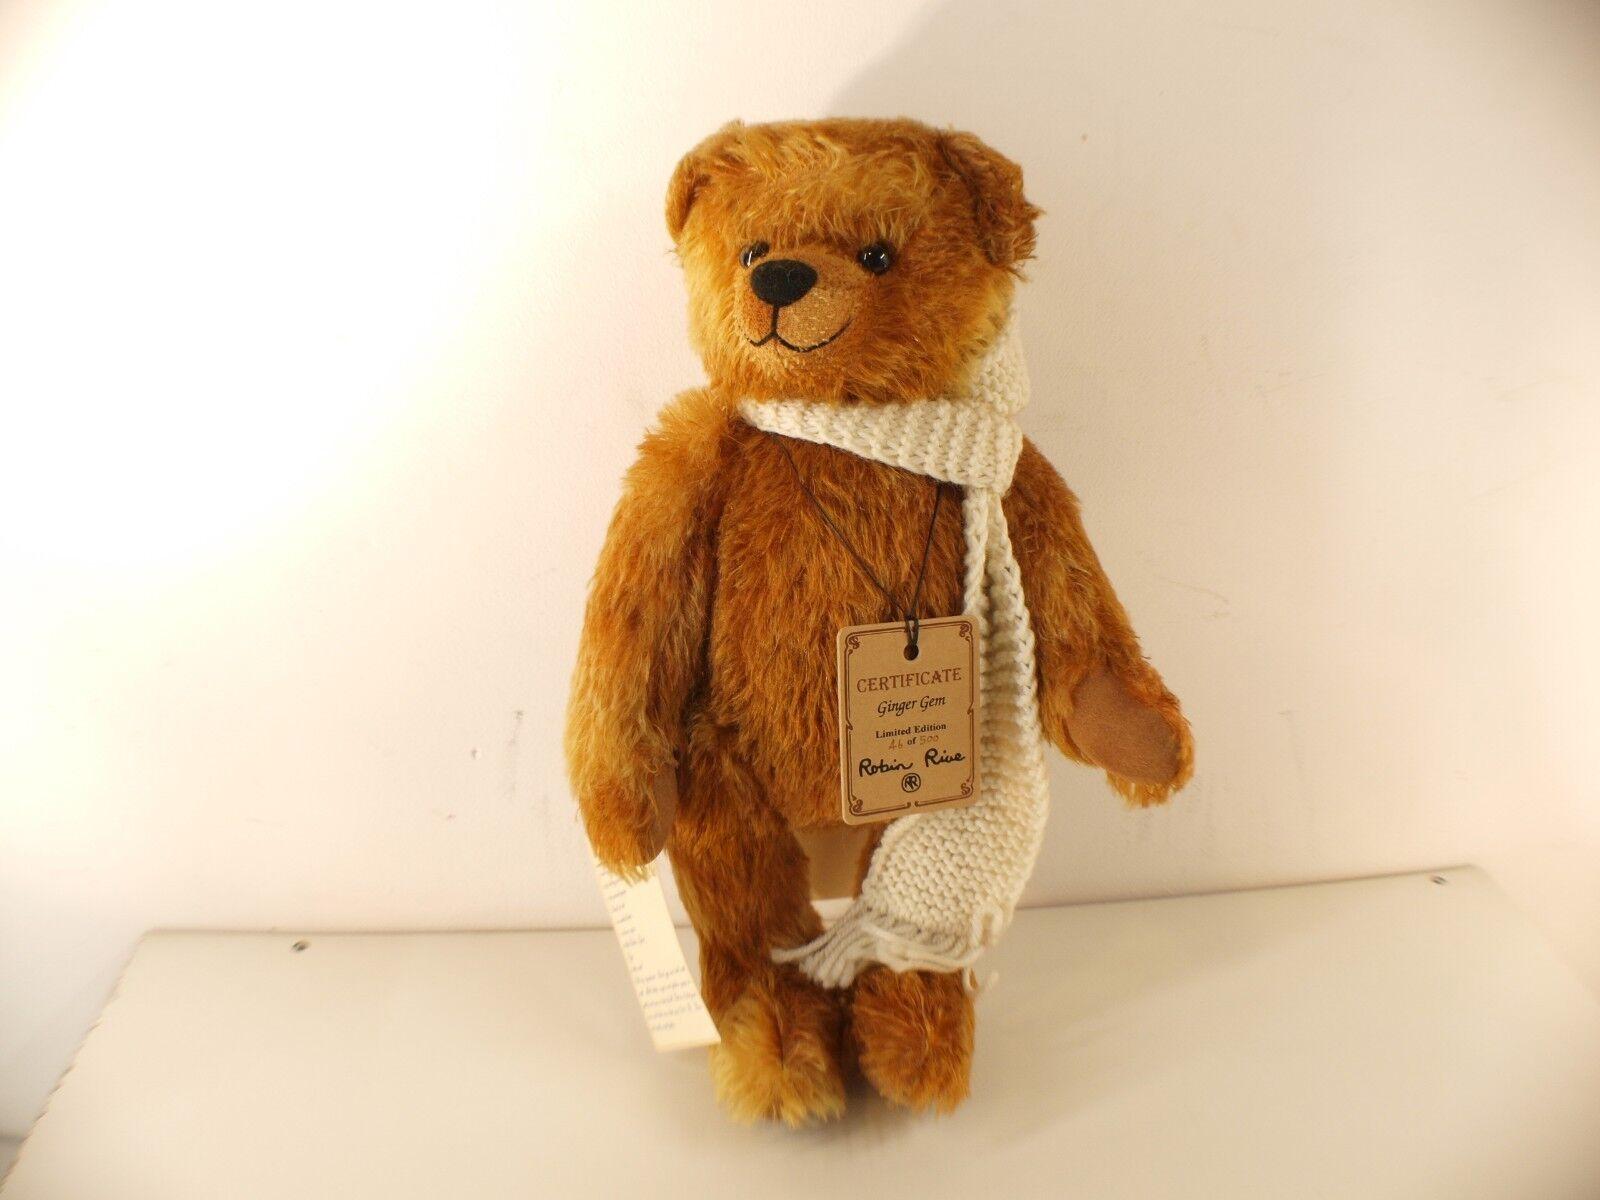 Robin Rive Teddy Bear Bear Bear   Ginger Gem   Limited Edition 46of500 36 cm New 9af9e7